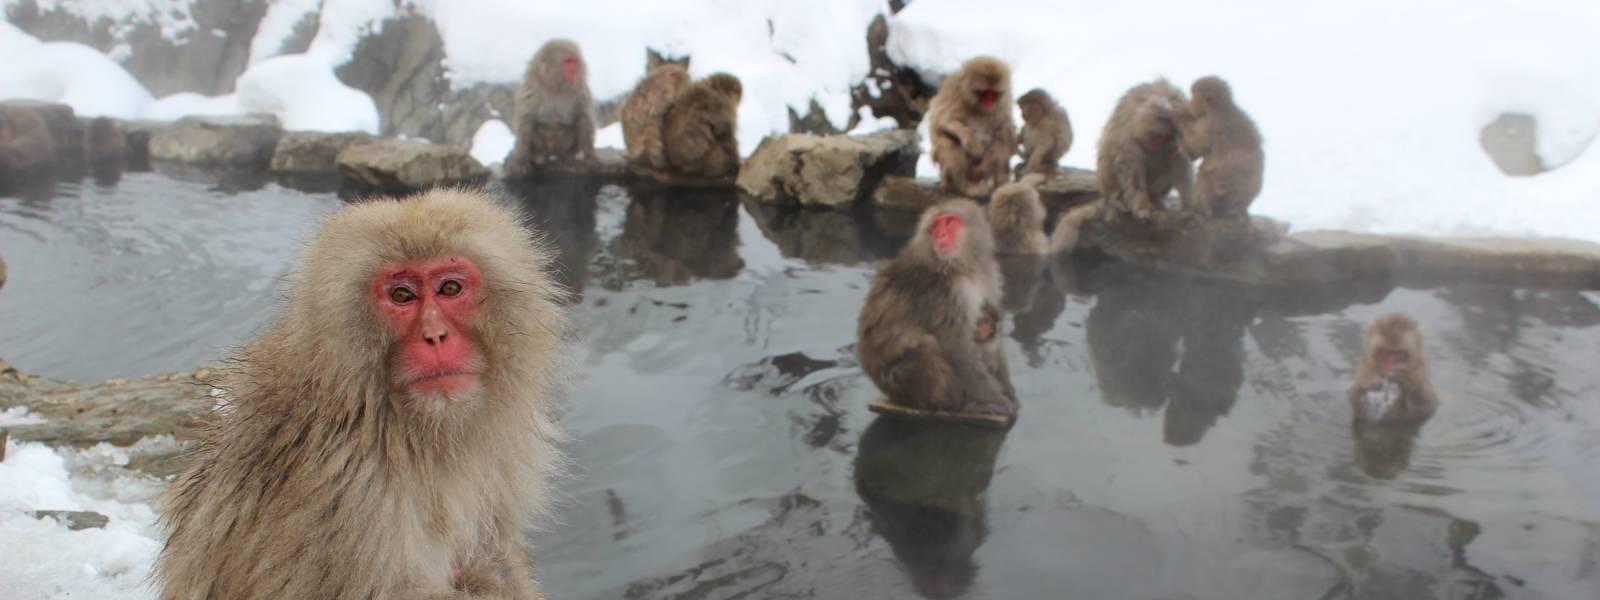 Snow monkeys Japan